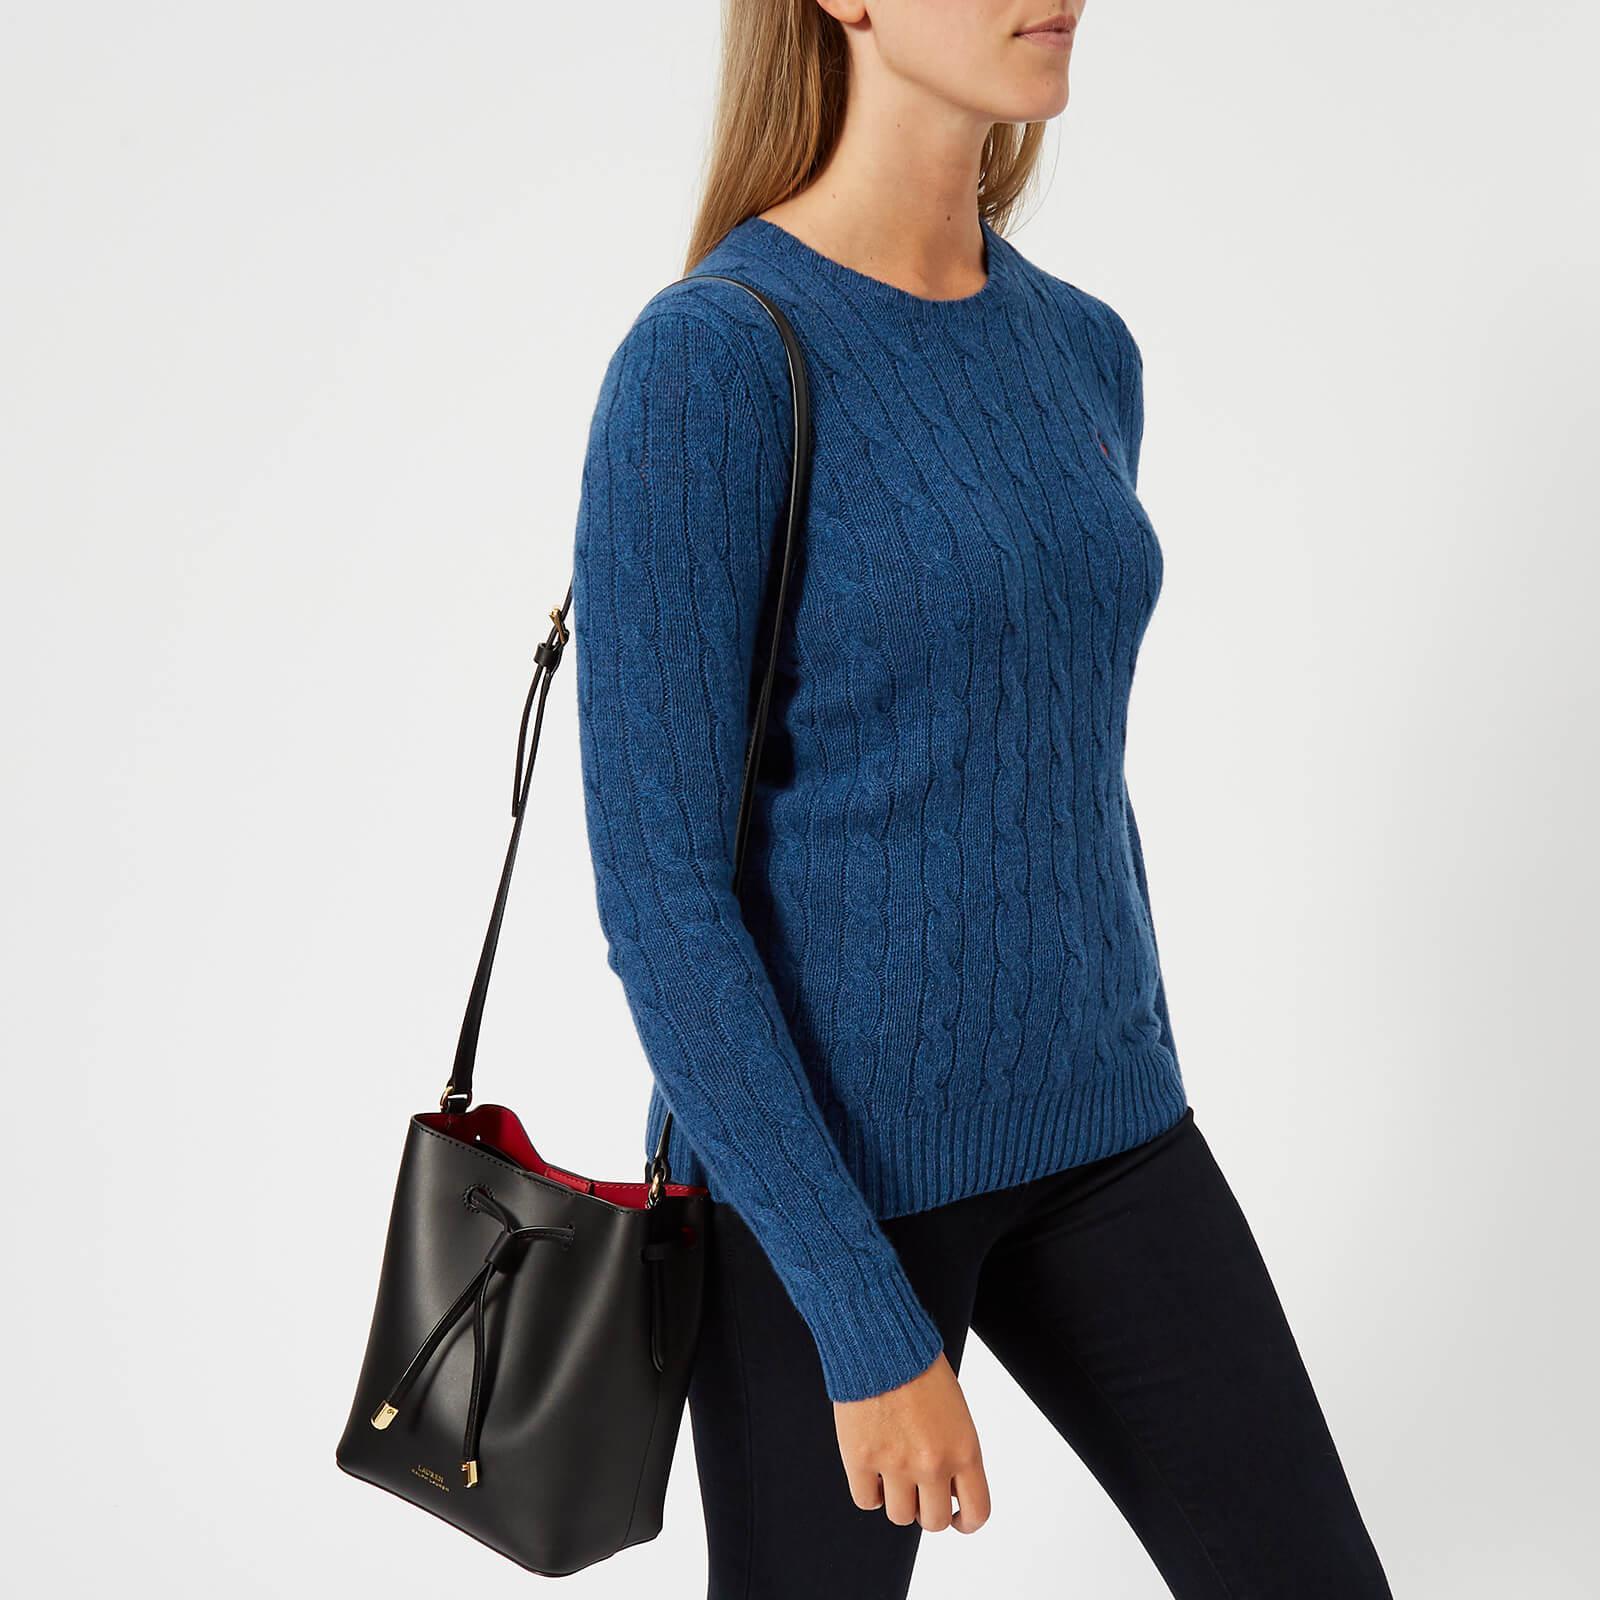 30d0d2b6fc Lauren by Ralph Lauren - Black Dryden Debby Ii Drawstring Mini Bag - Lyst.  View fullscreen